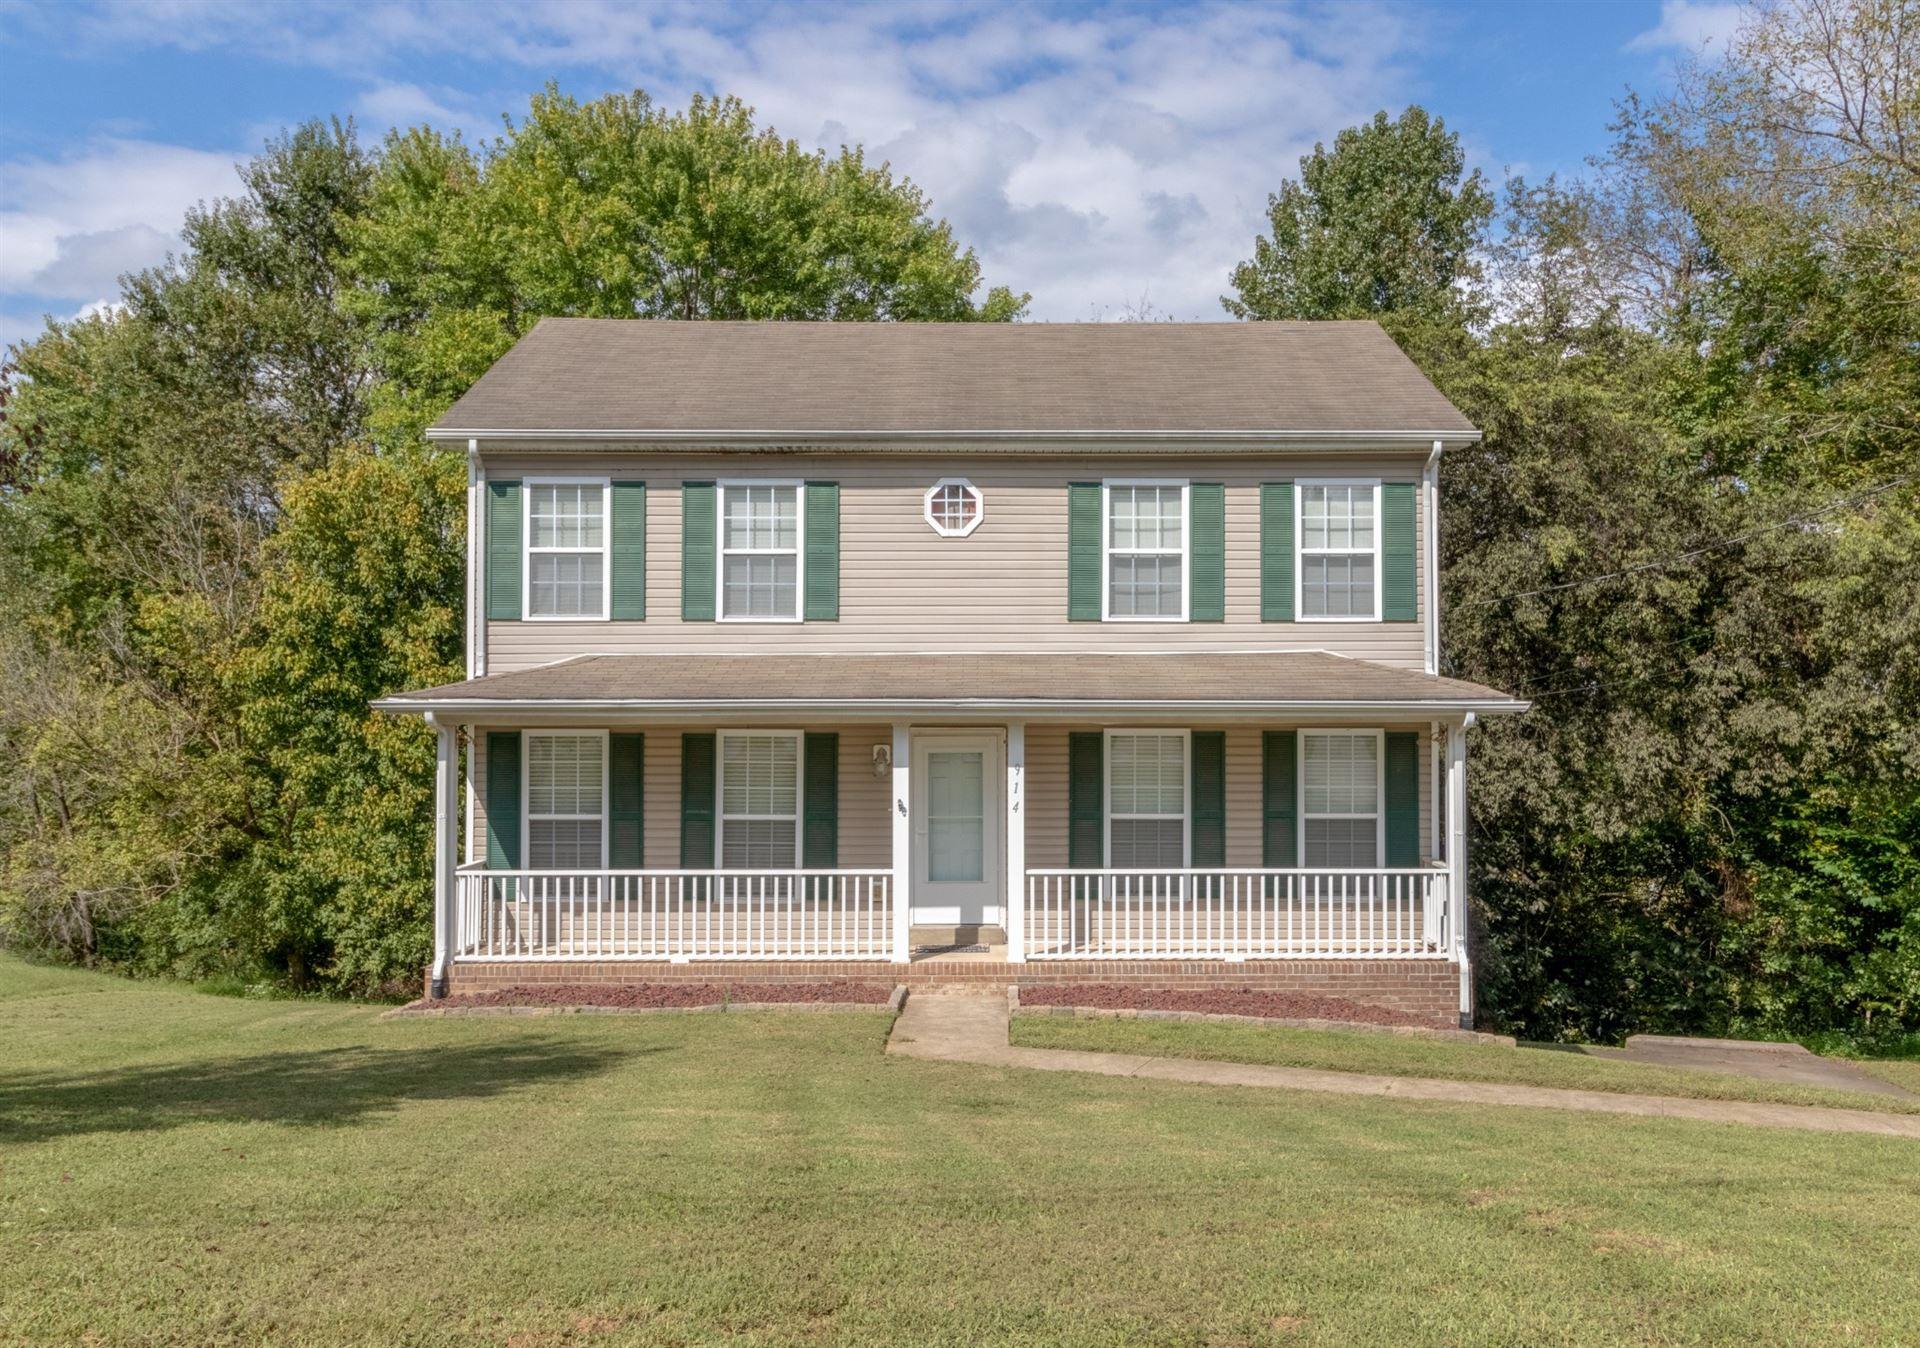 914 Hedge Apple Dr, Clarksville, TN 37040 - MLS#: 2299229